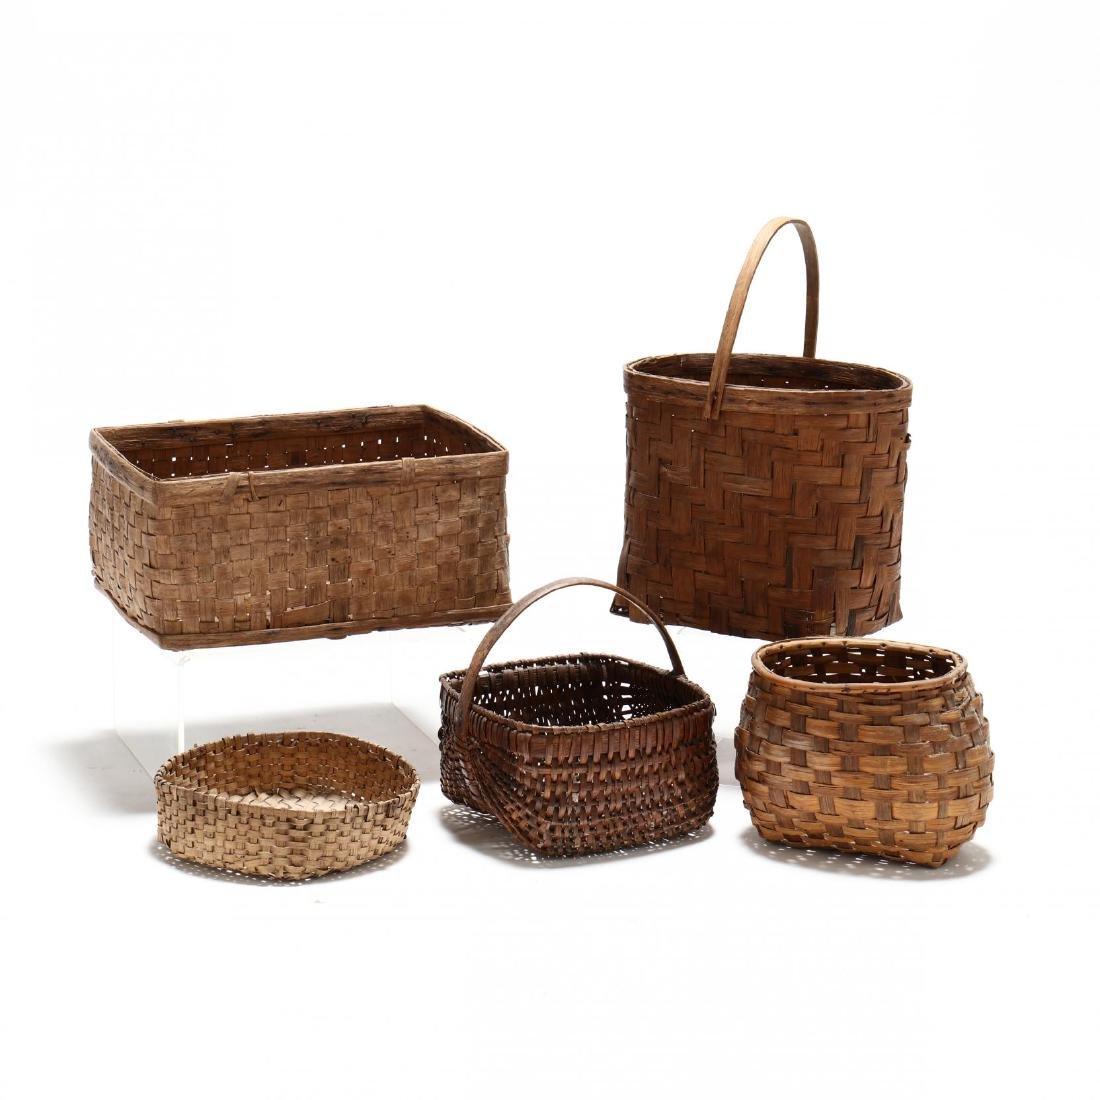 Five Farm Use Baskets